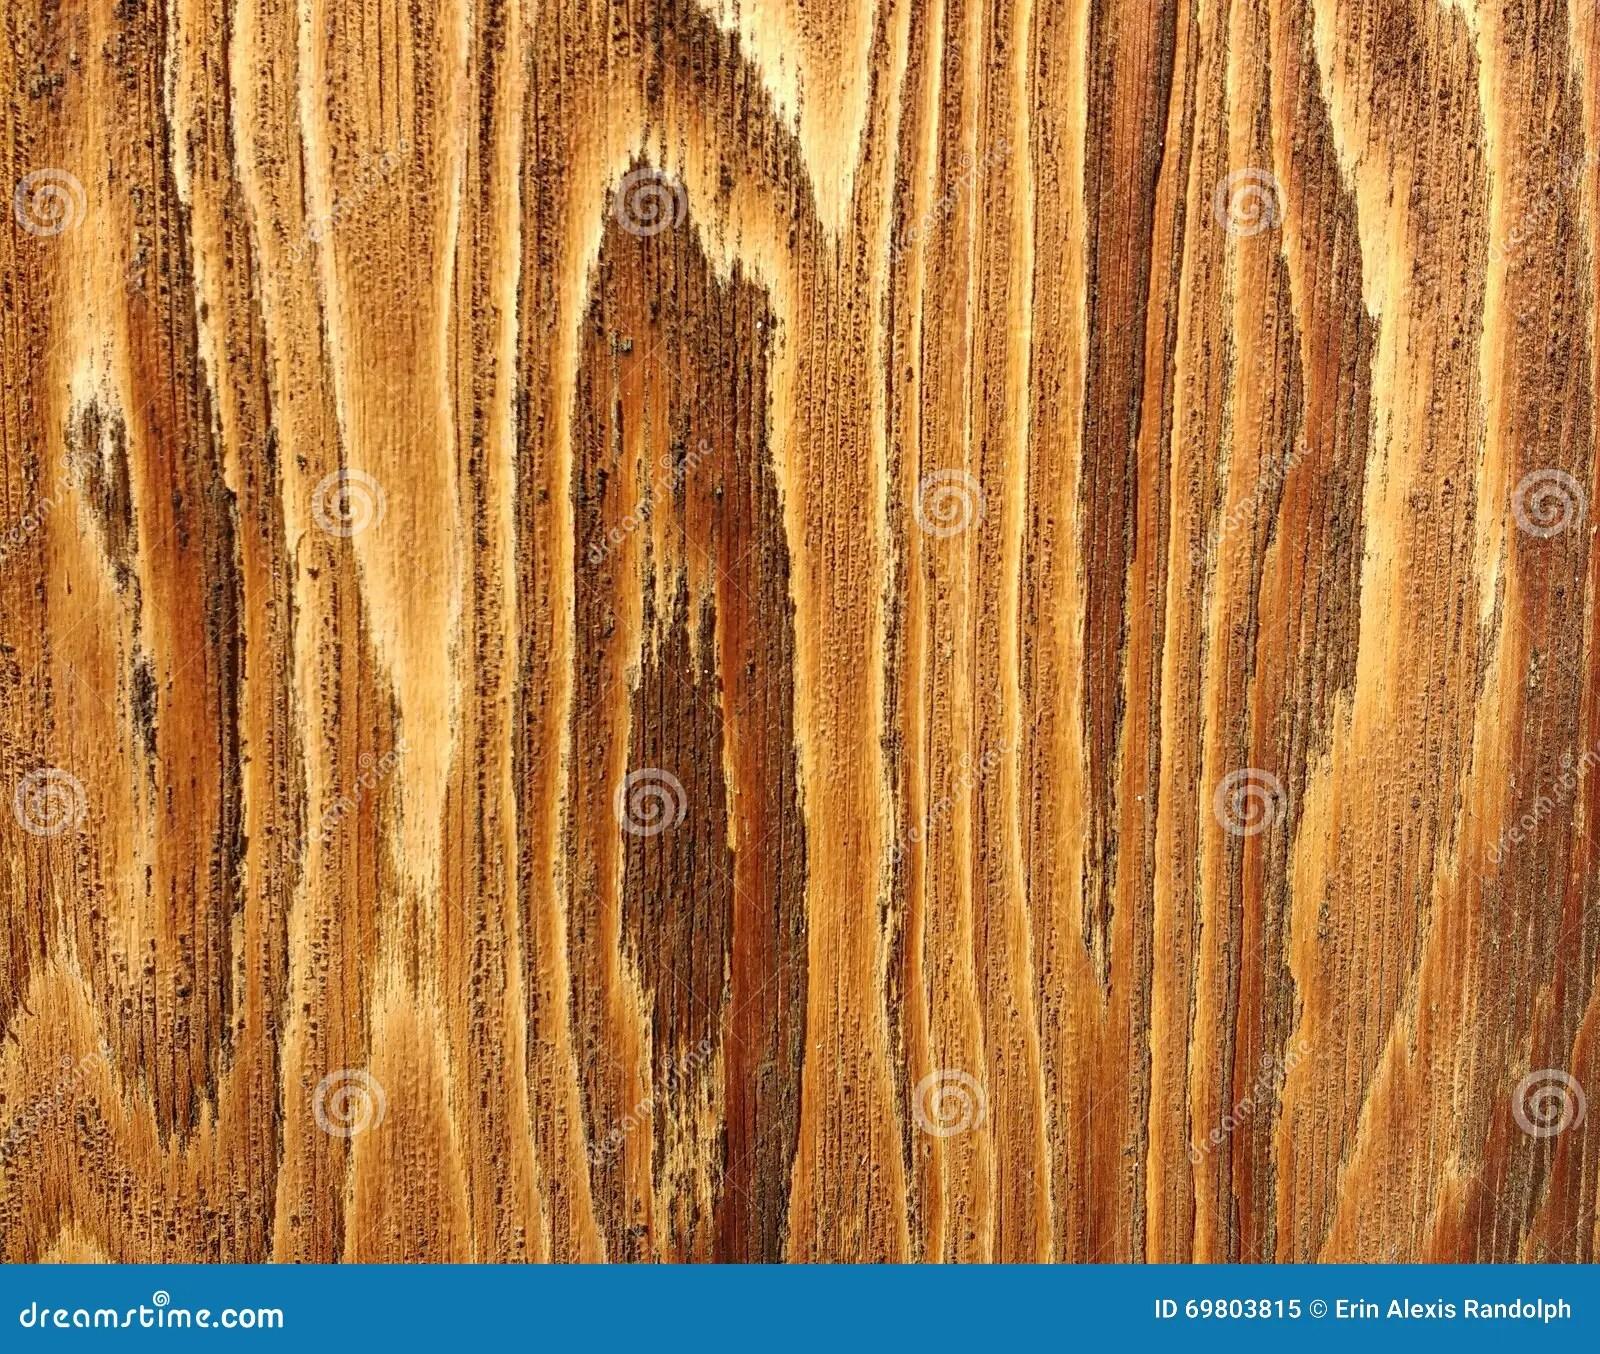 hight resolution of beautiful detail of wood grain